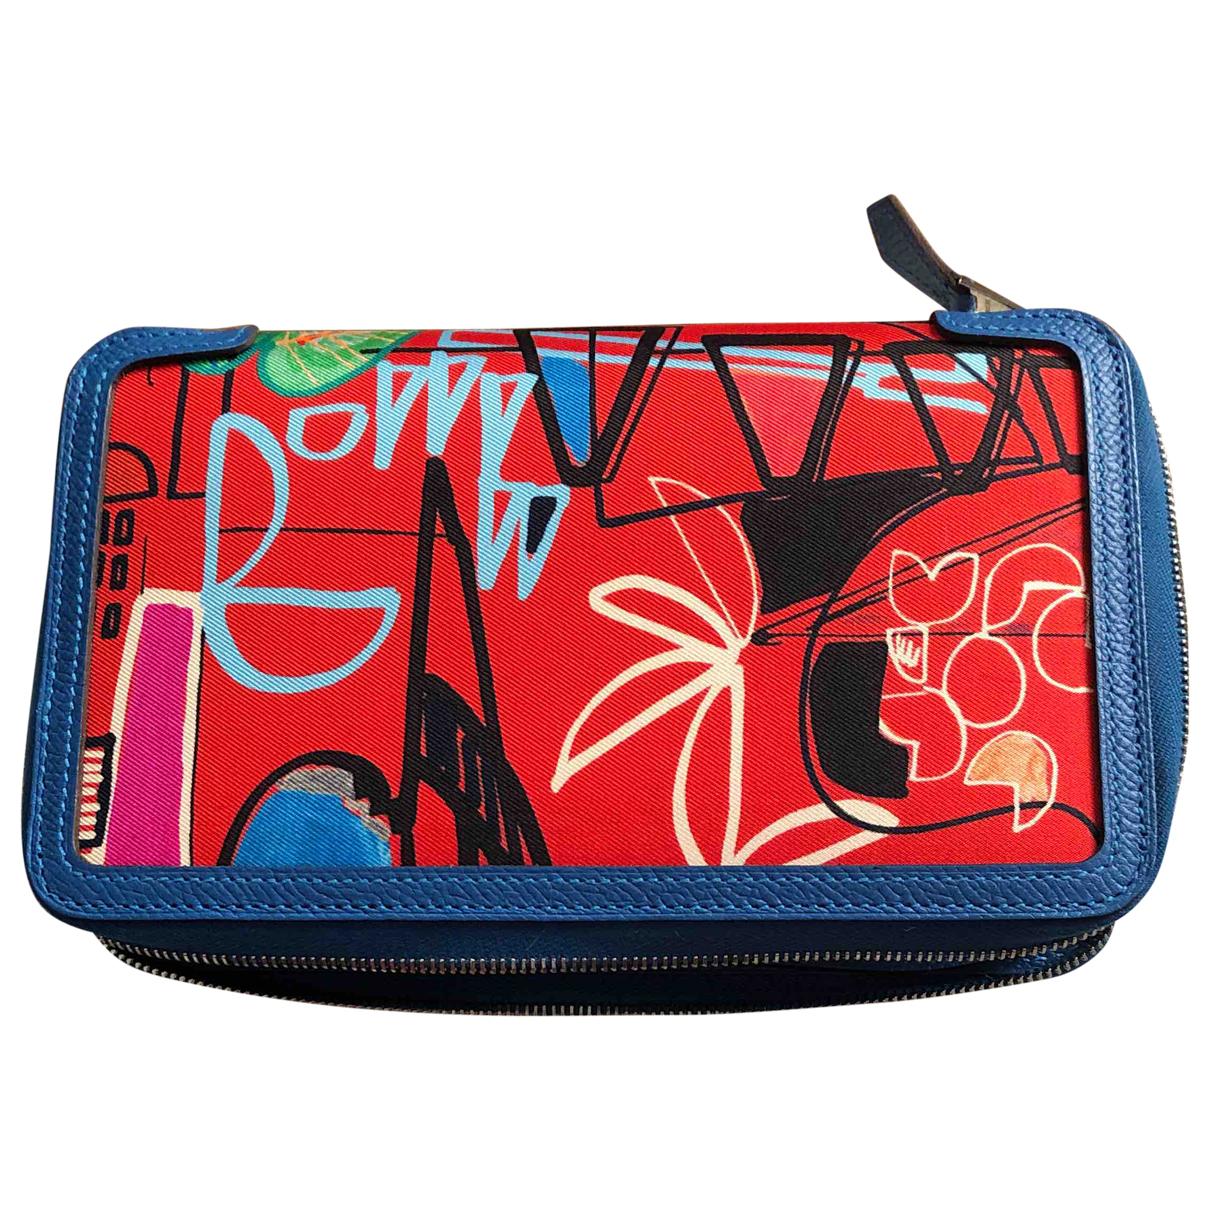 Hermès \N Multicolour Leather wallet for Women \N